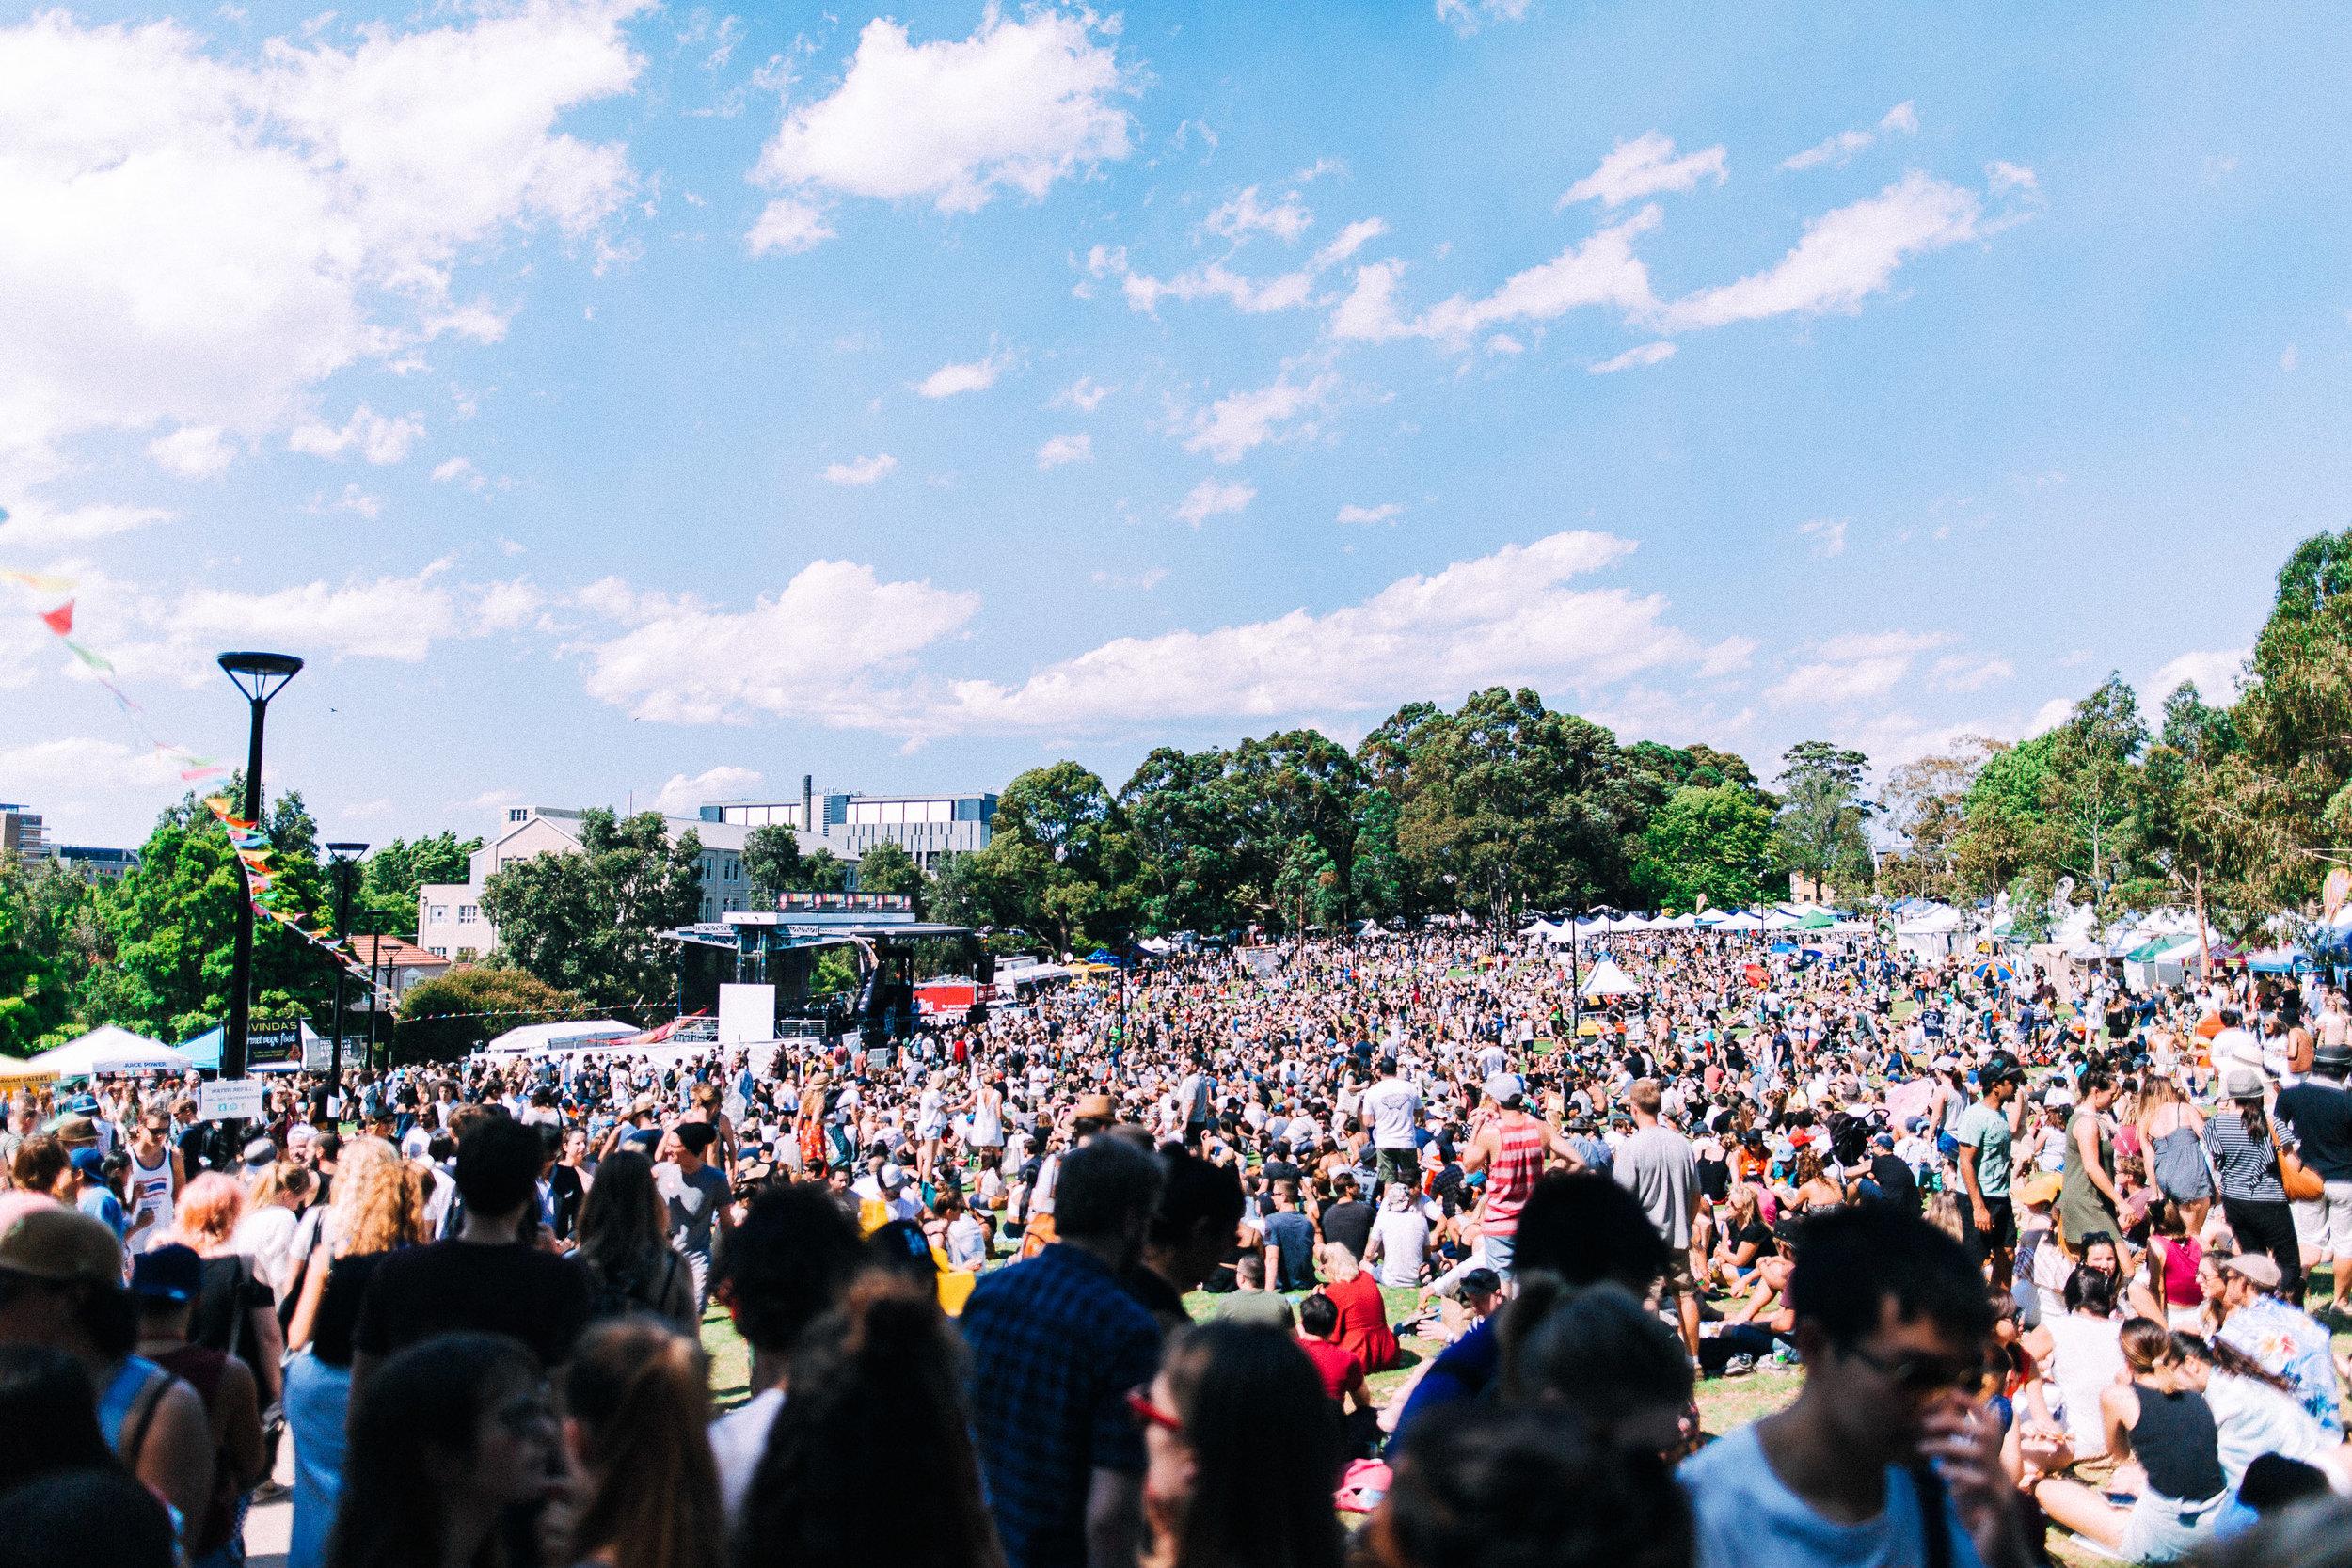 Newtown_Festival-8226.jpg